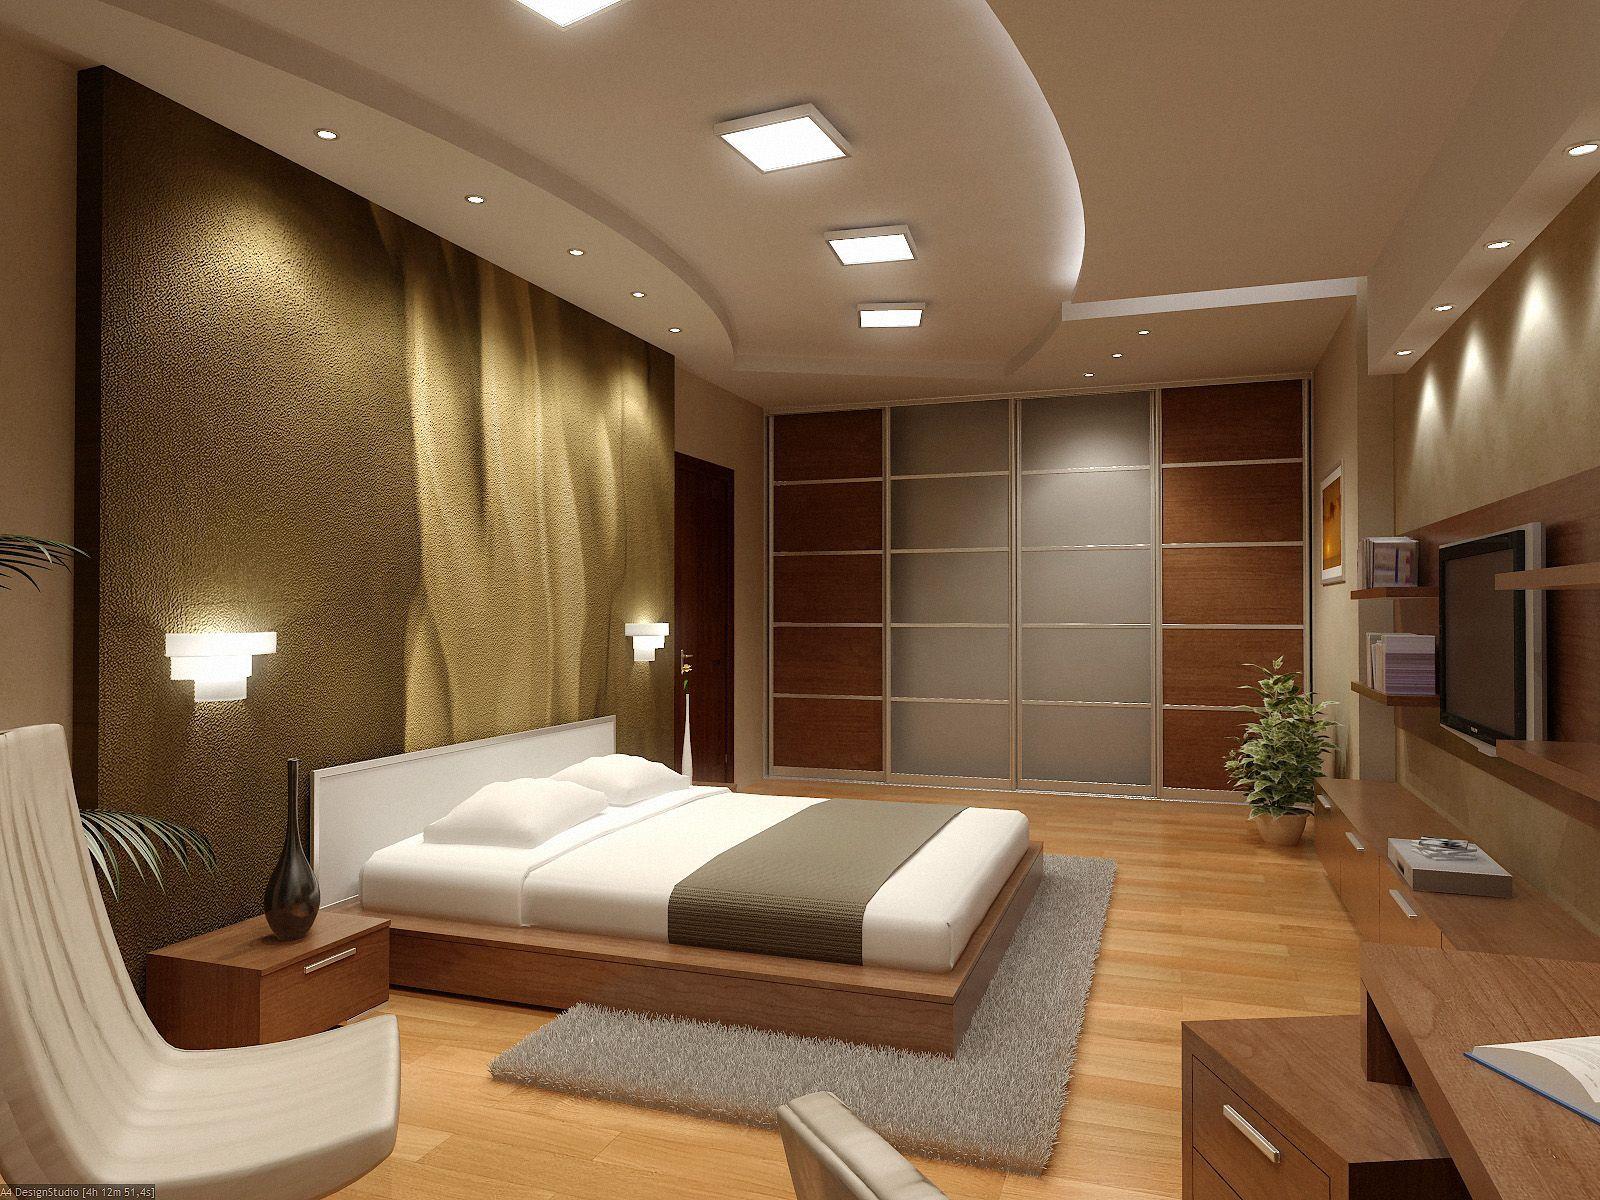 LuxuryModernHomeSingapore_1 iDesignArch Interior